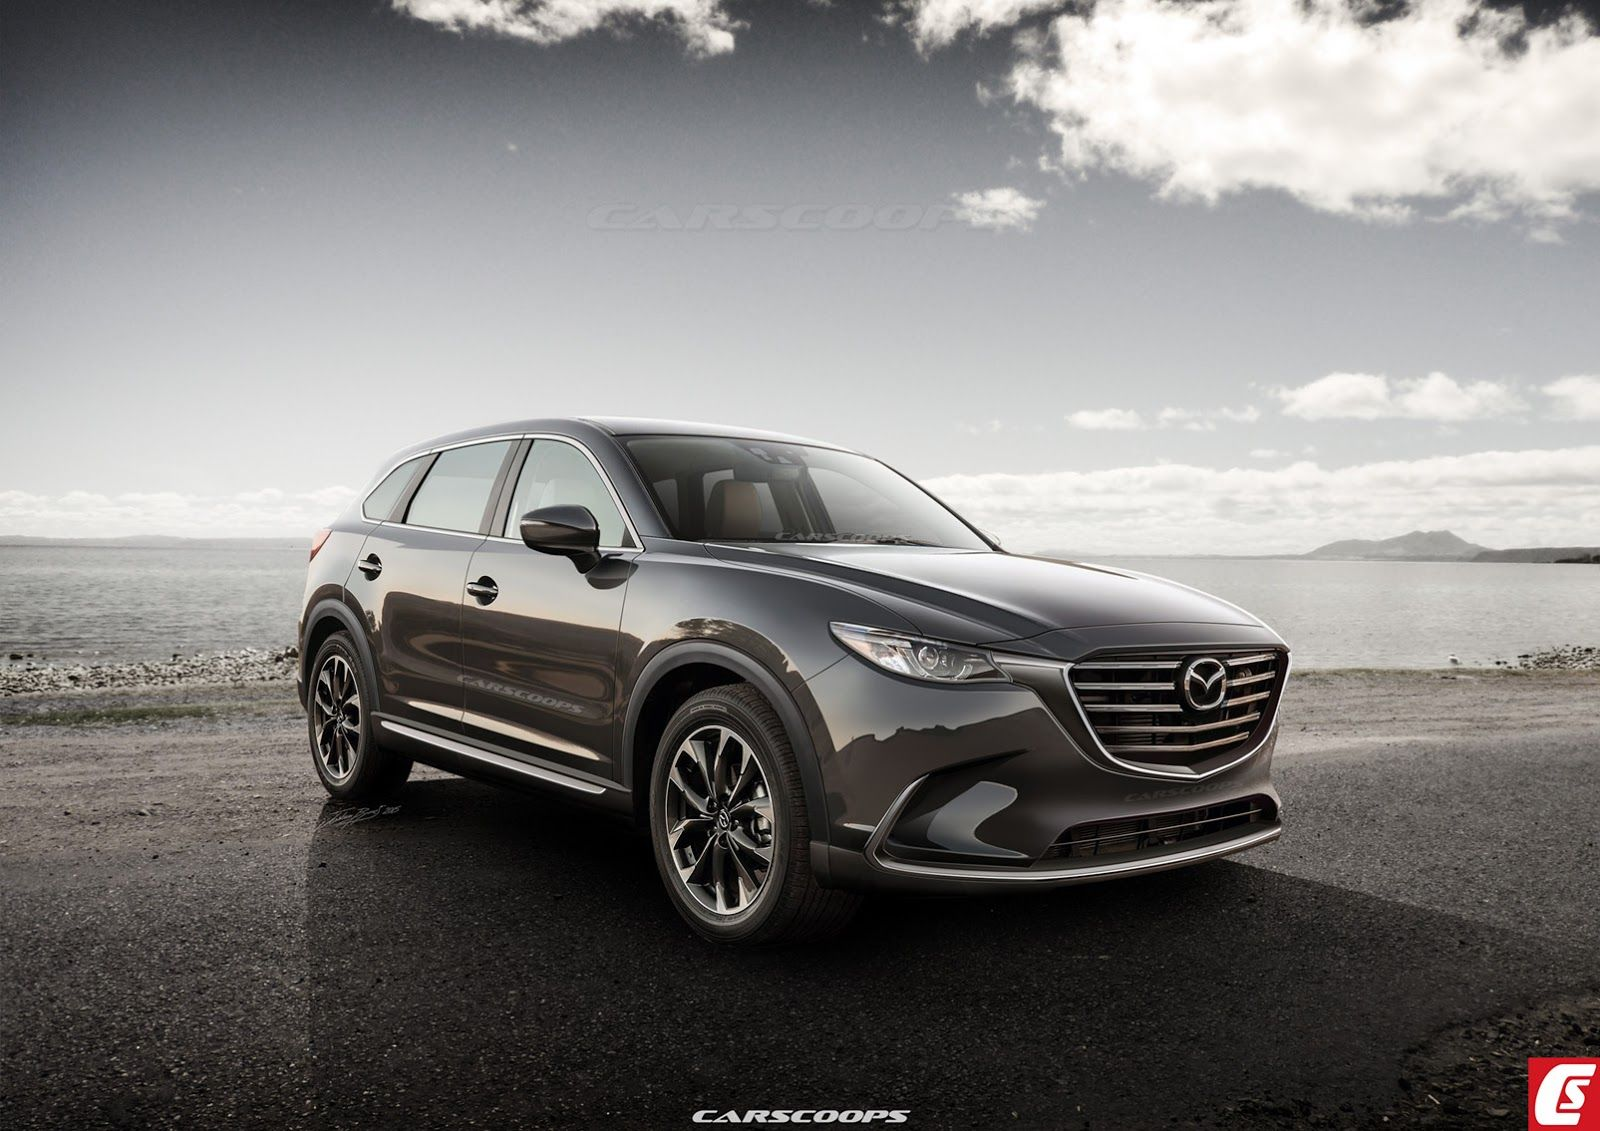 2017 mazda cx 3 grand touring review australia cars for you - 2017 Mazda Cx 9 Design And Price Http Www Carstim